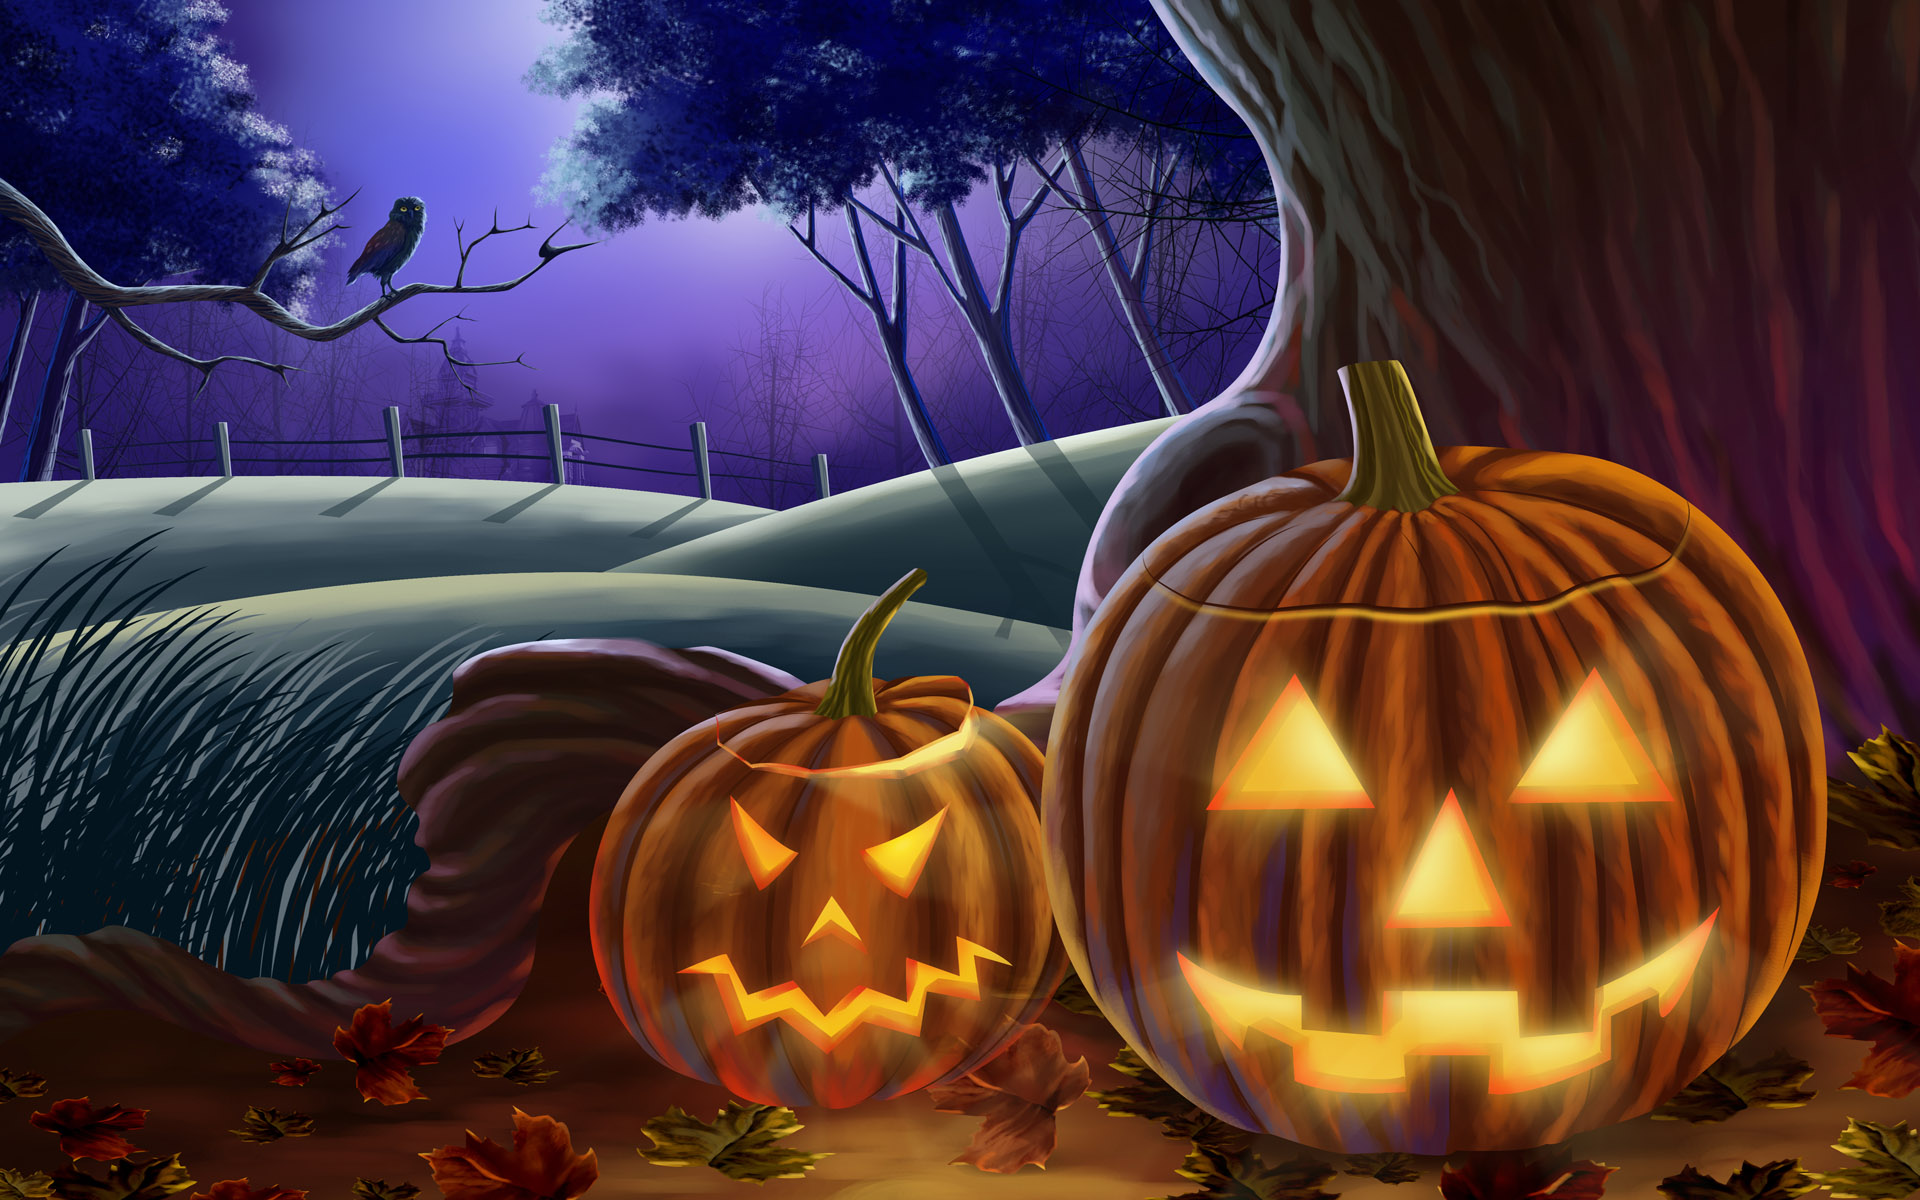 Halloween Res: 1920x1200 / Size:453kb. Views: 14553